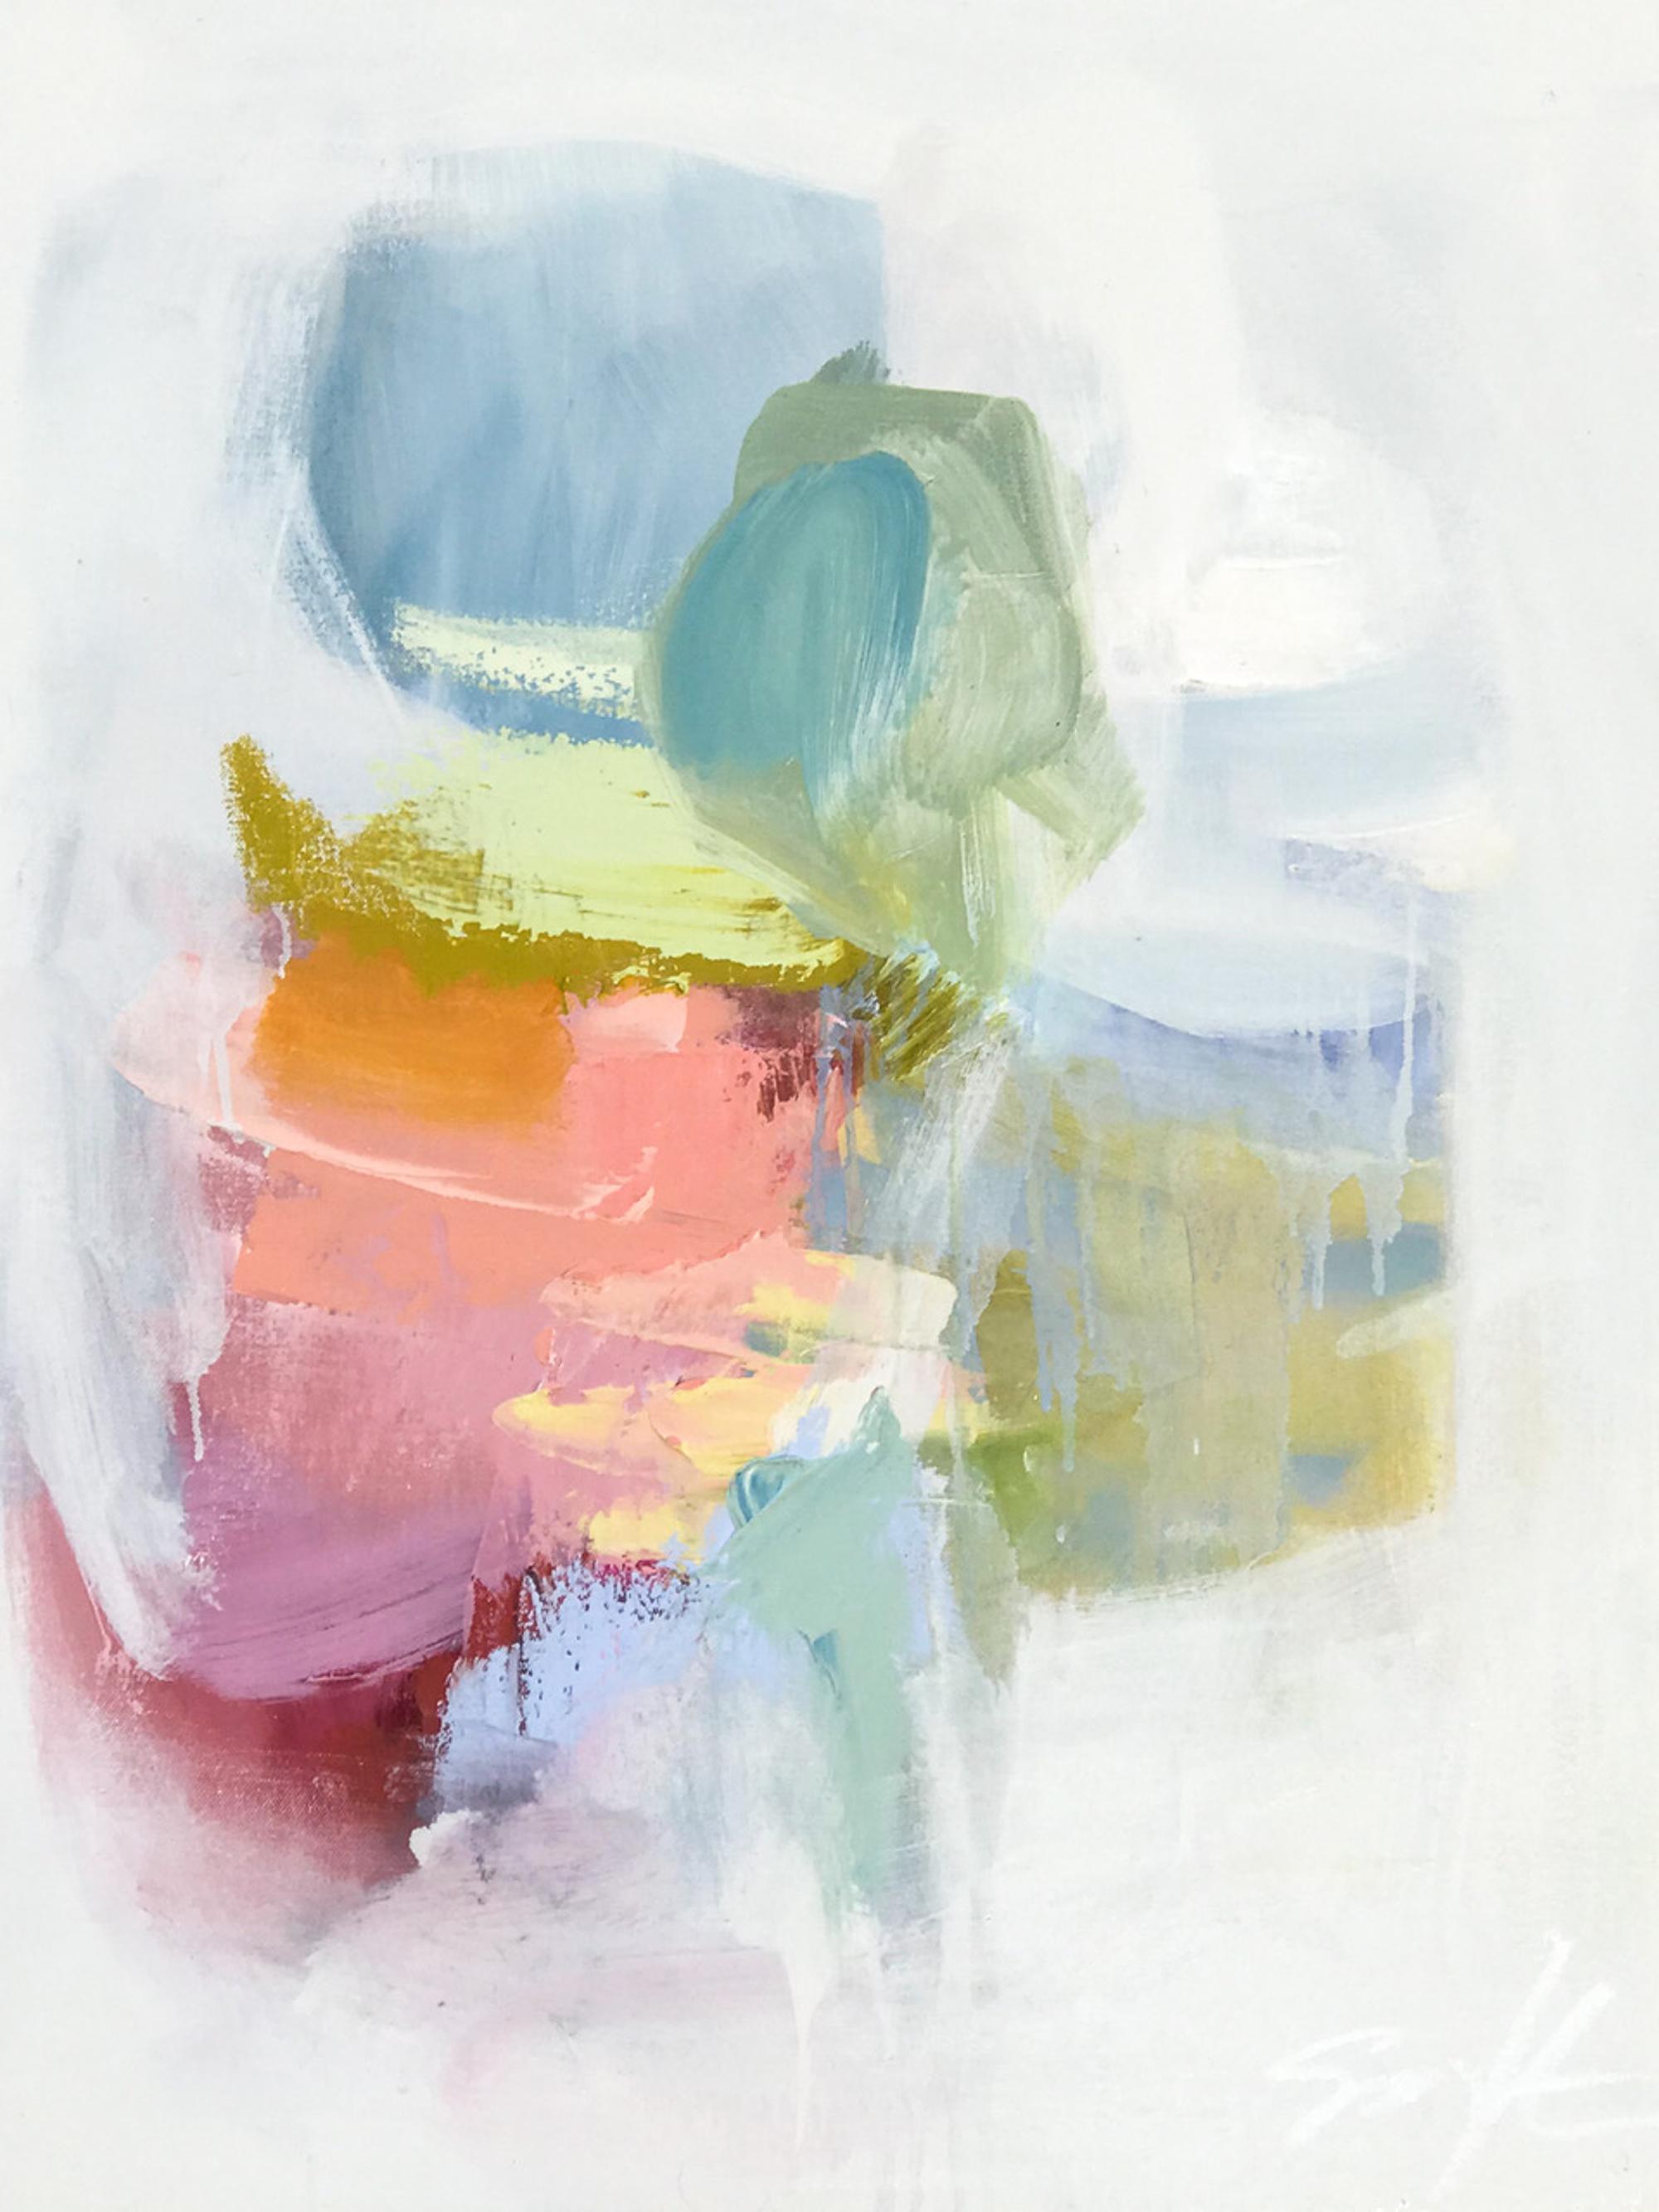 Wandering Hope II by Sarah Otts